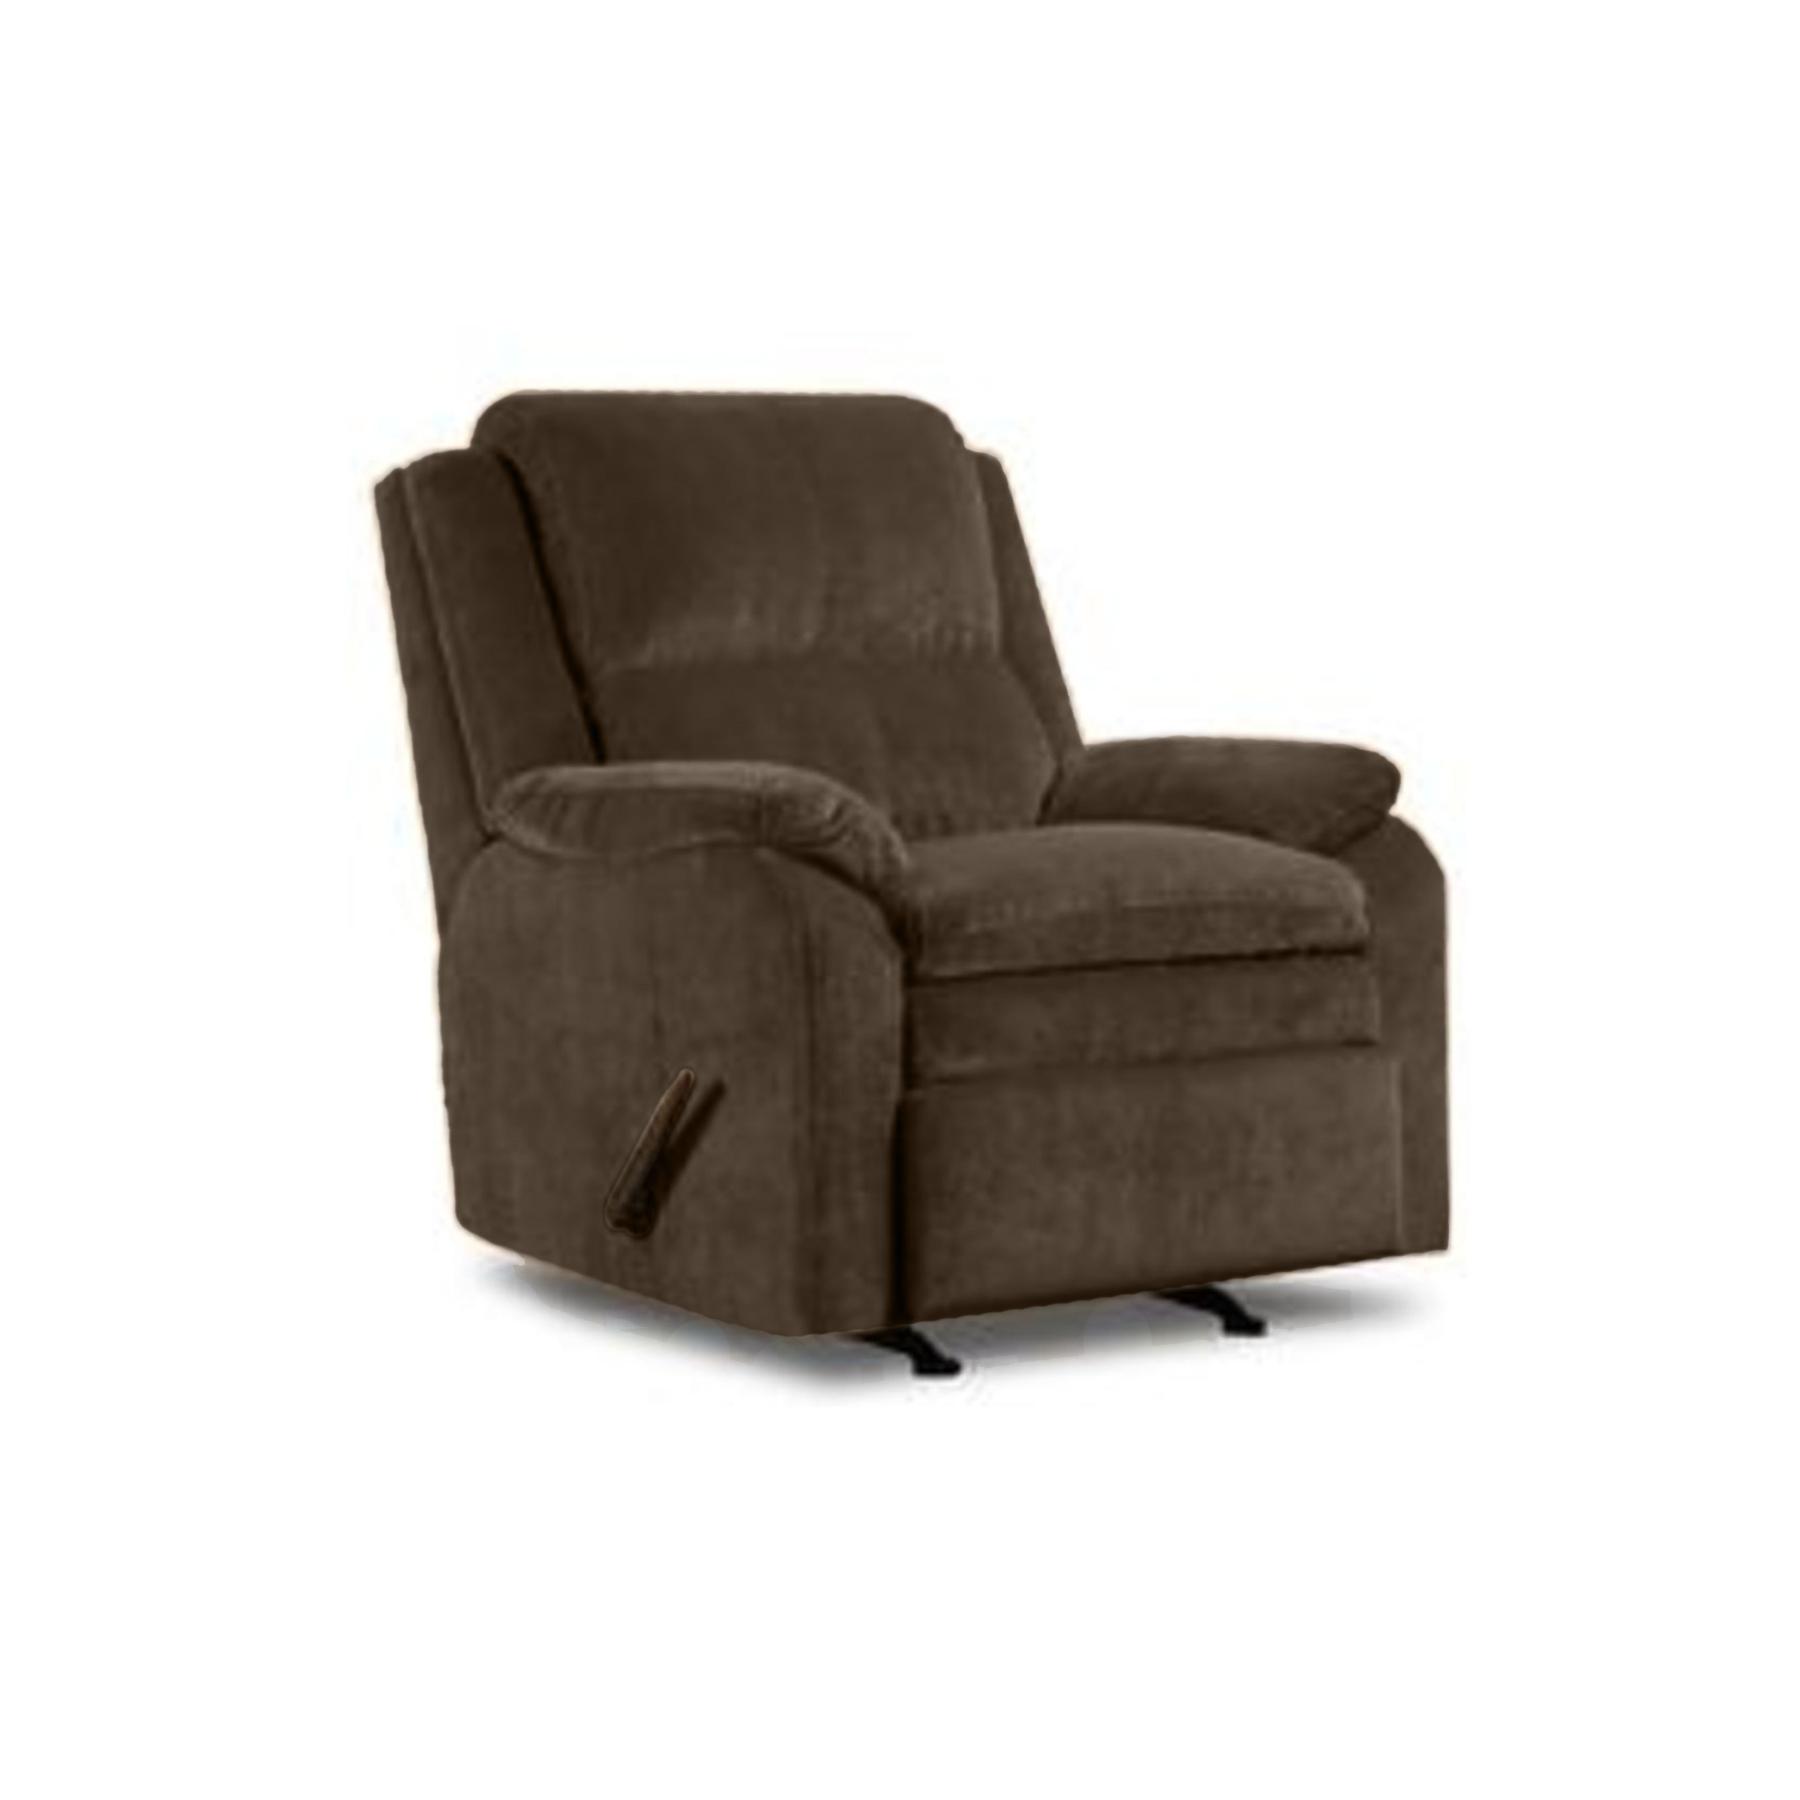 sears recliner chairs walmart beach chair simmons upholstery brown pub back rocker shop